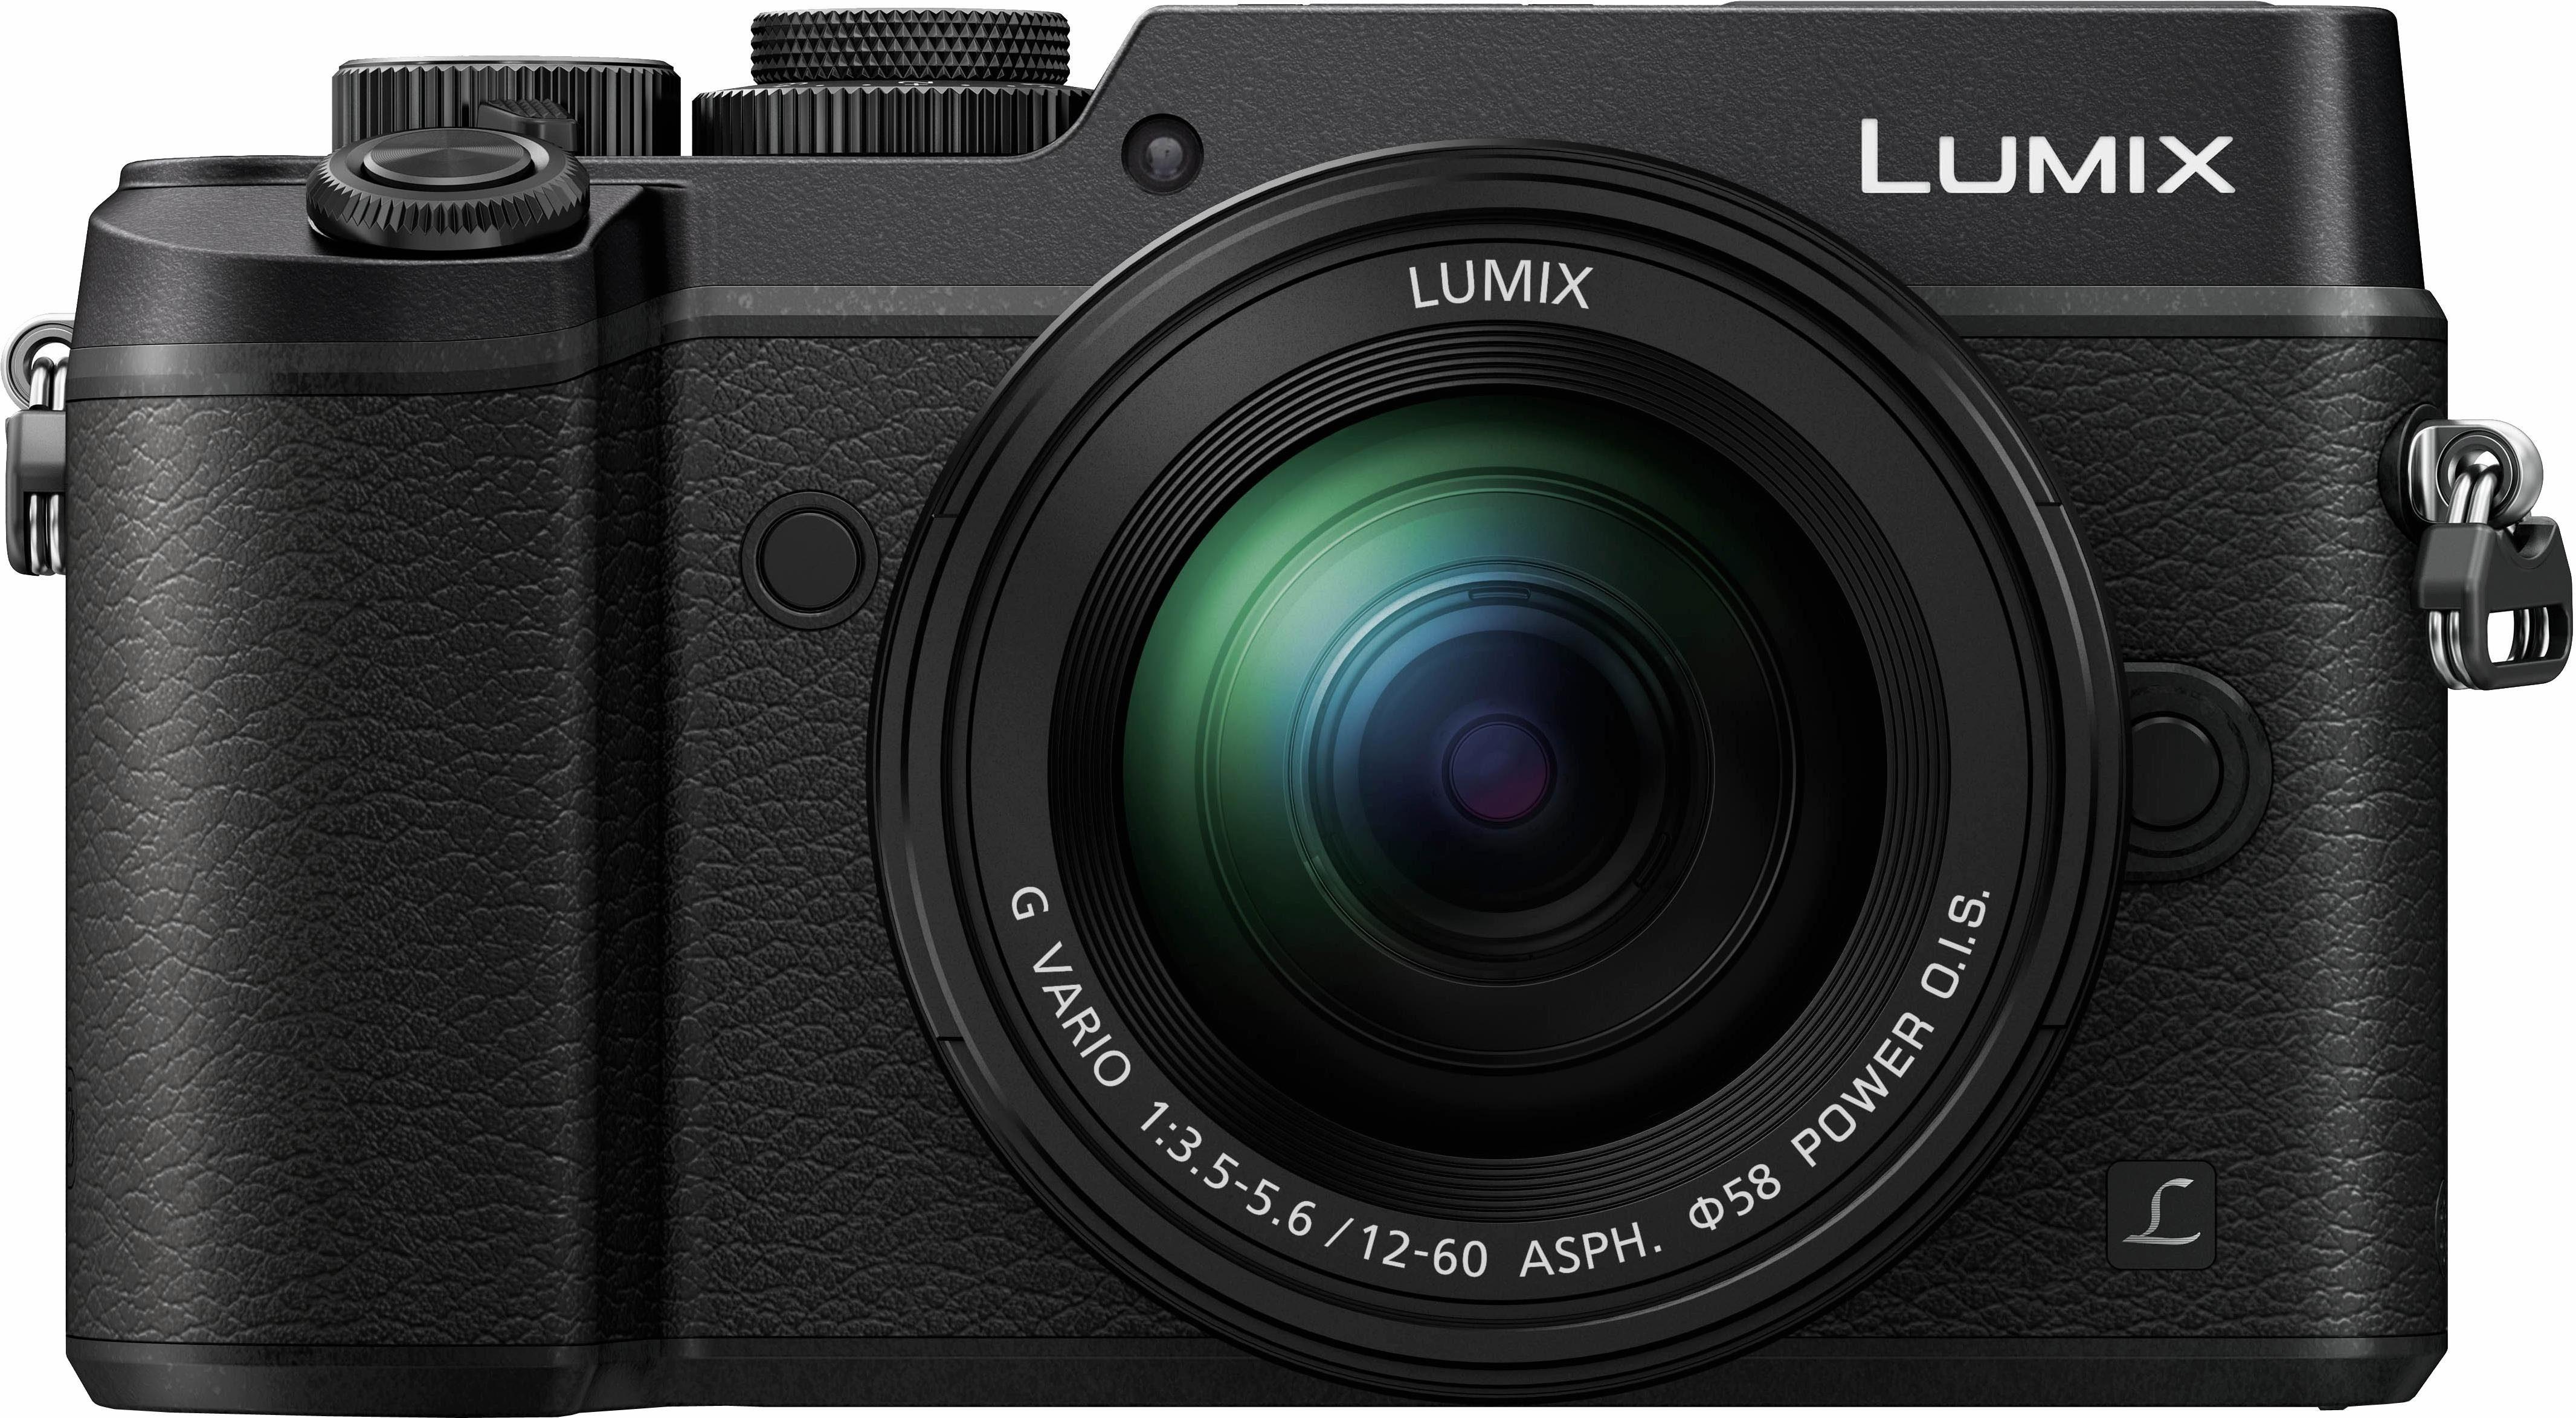 Lumix Panasonic DMC-GX8MEG-K System Kamera, Zoom, 20,3 Megapixel, 7,5 cm (3 Zoll) Display